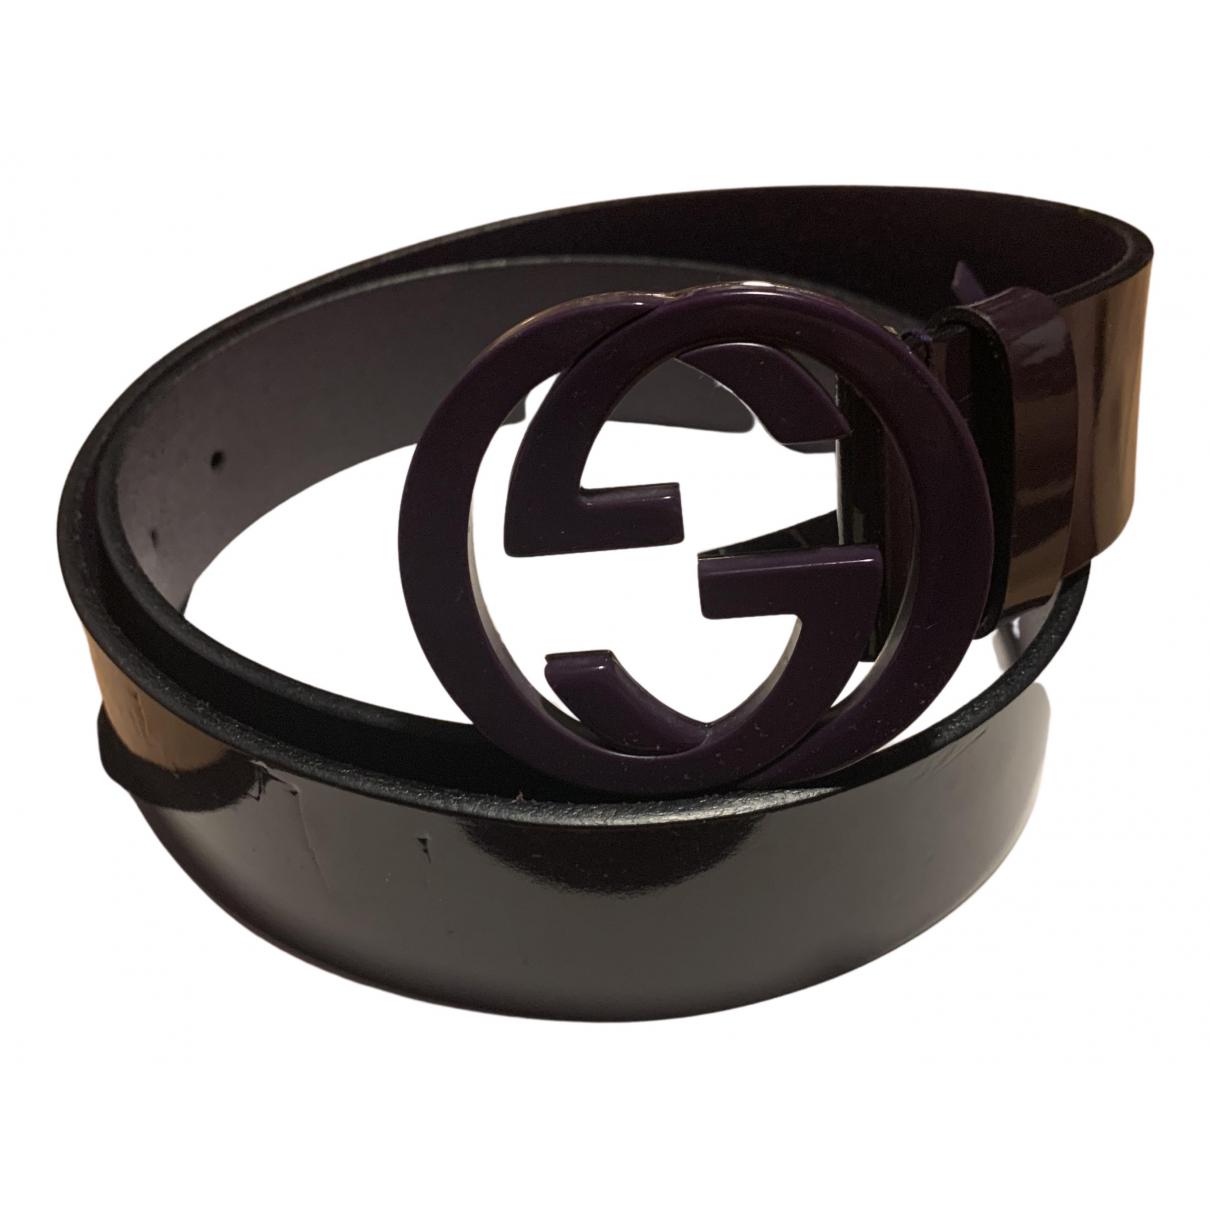 Gucci Interlocking Buckle Purple Leather belt for Women 85 cm